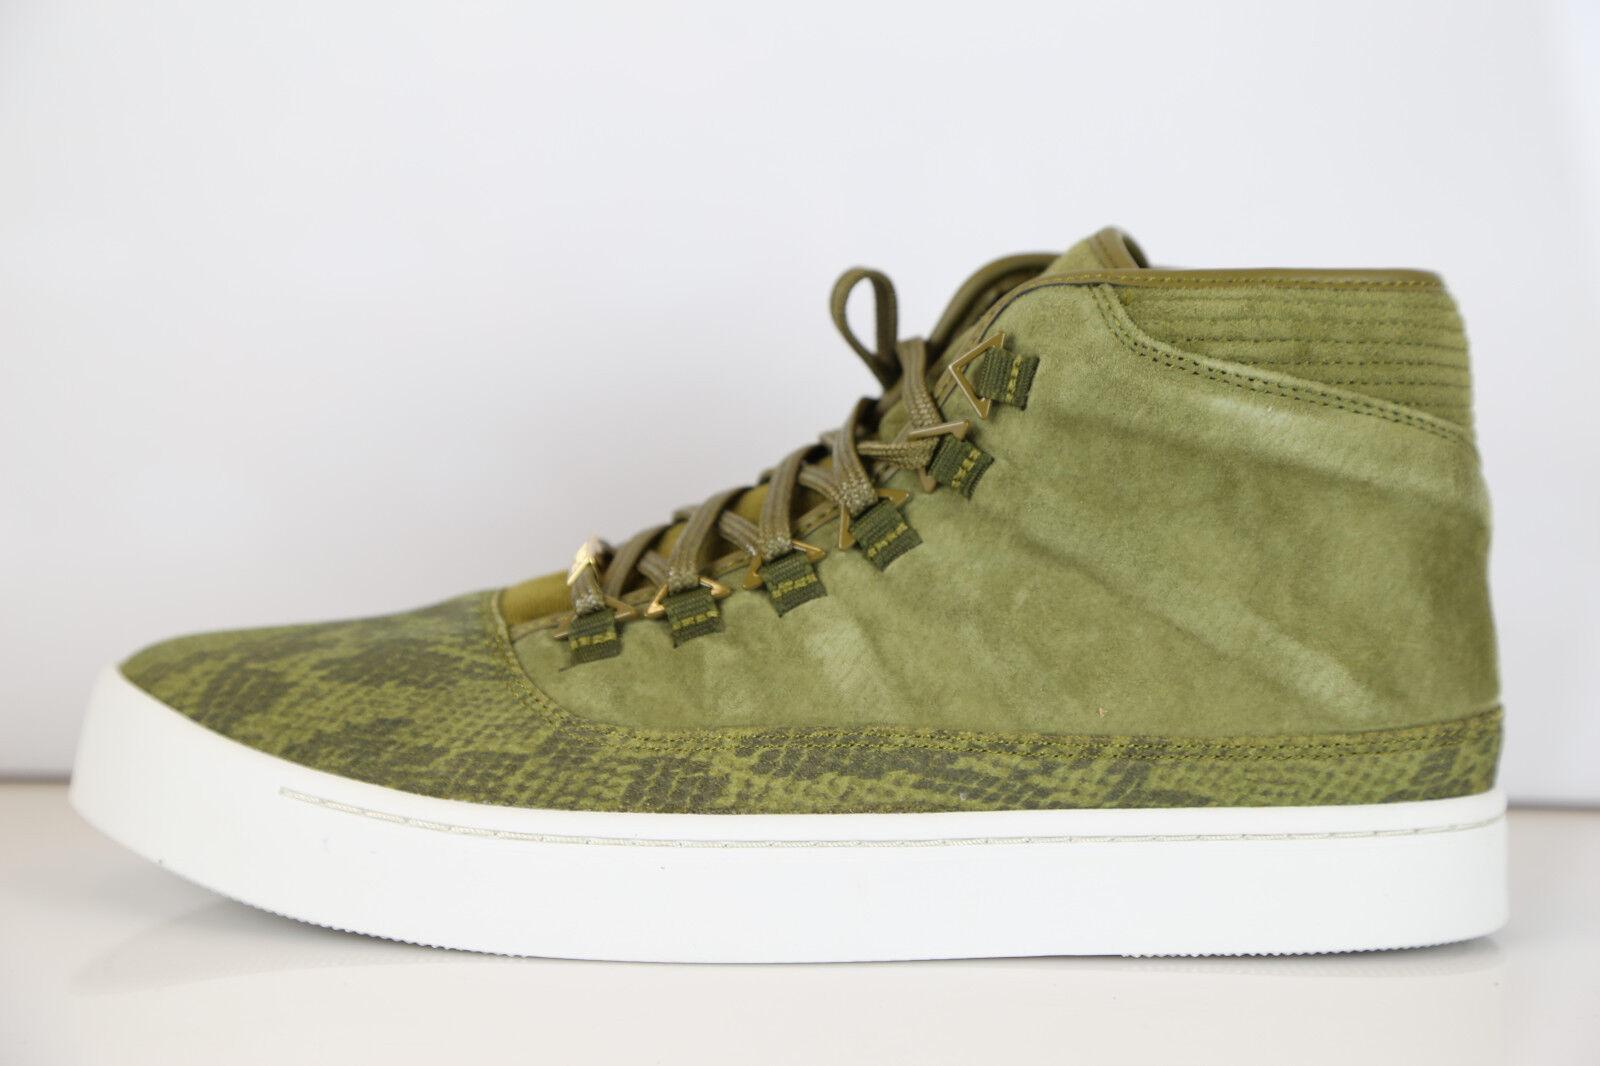 Nike Air Jordan Westbrook Militia verde Gold 1 768934-305 7-13 snakeskin 1 Gold 11 3 6 978e86